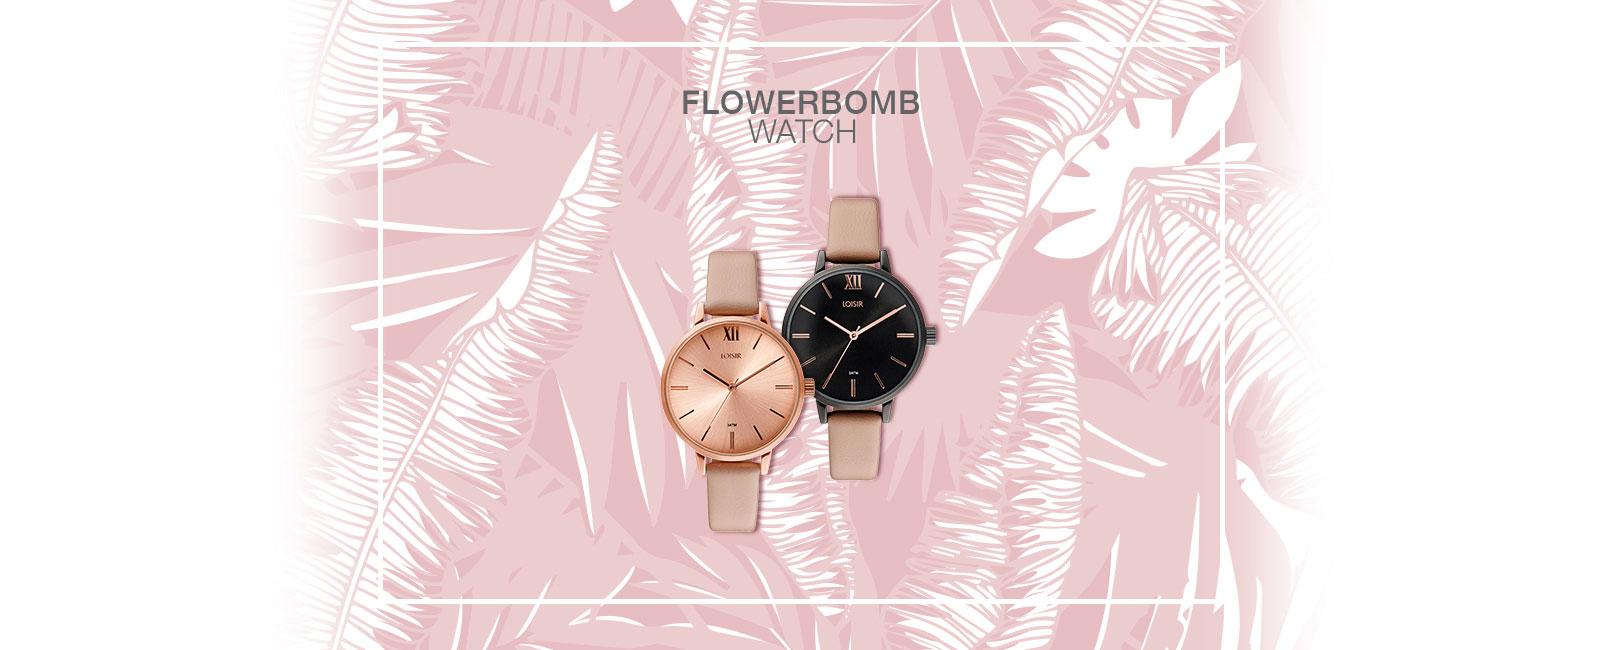 Flowerbomb Watch - Loisir